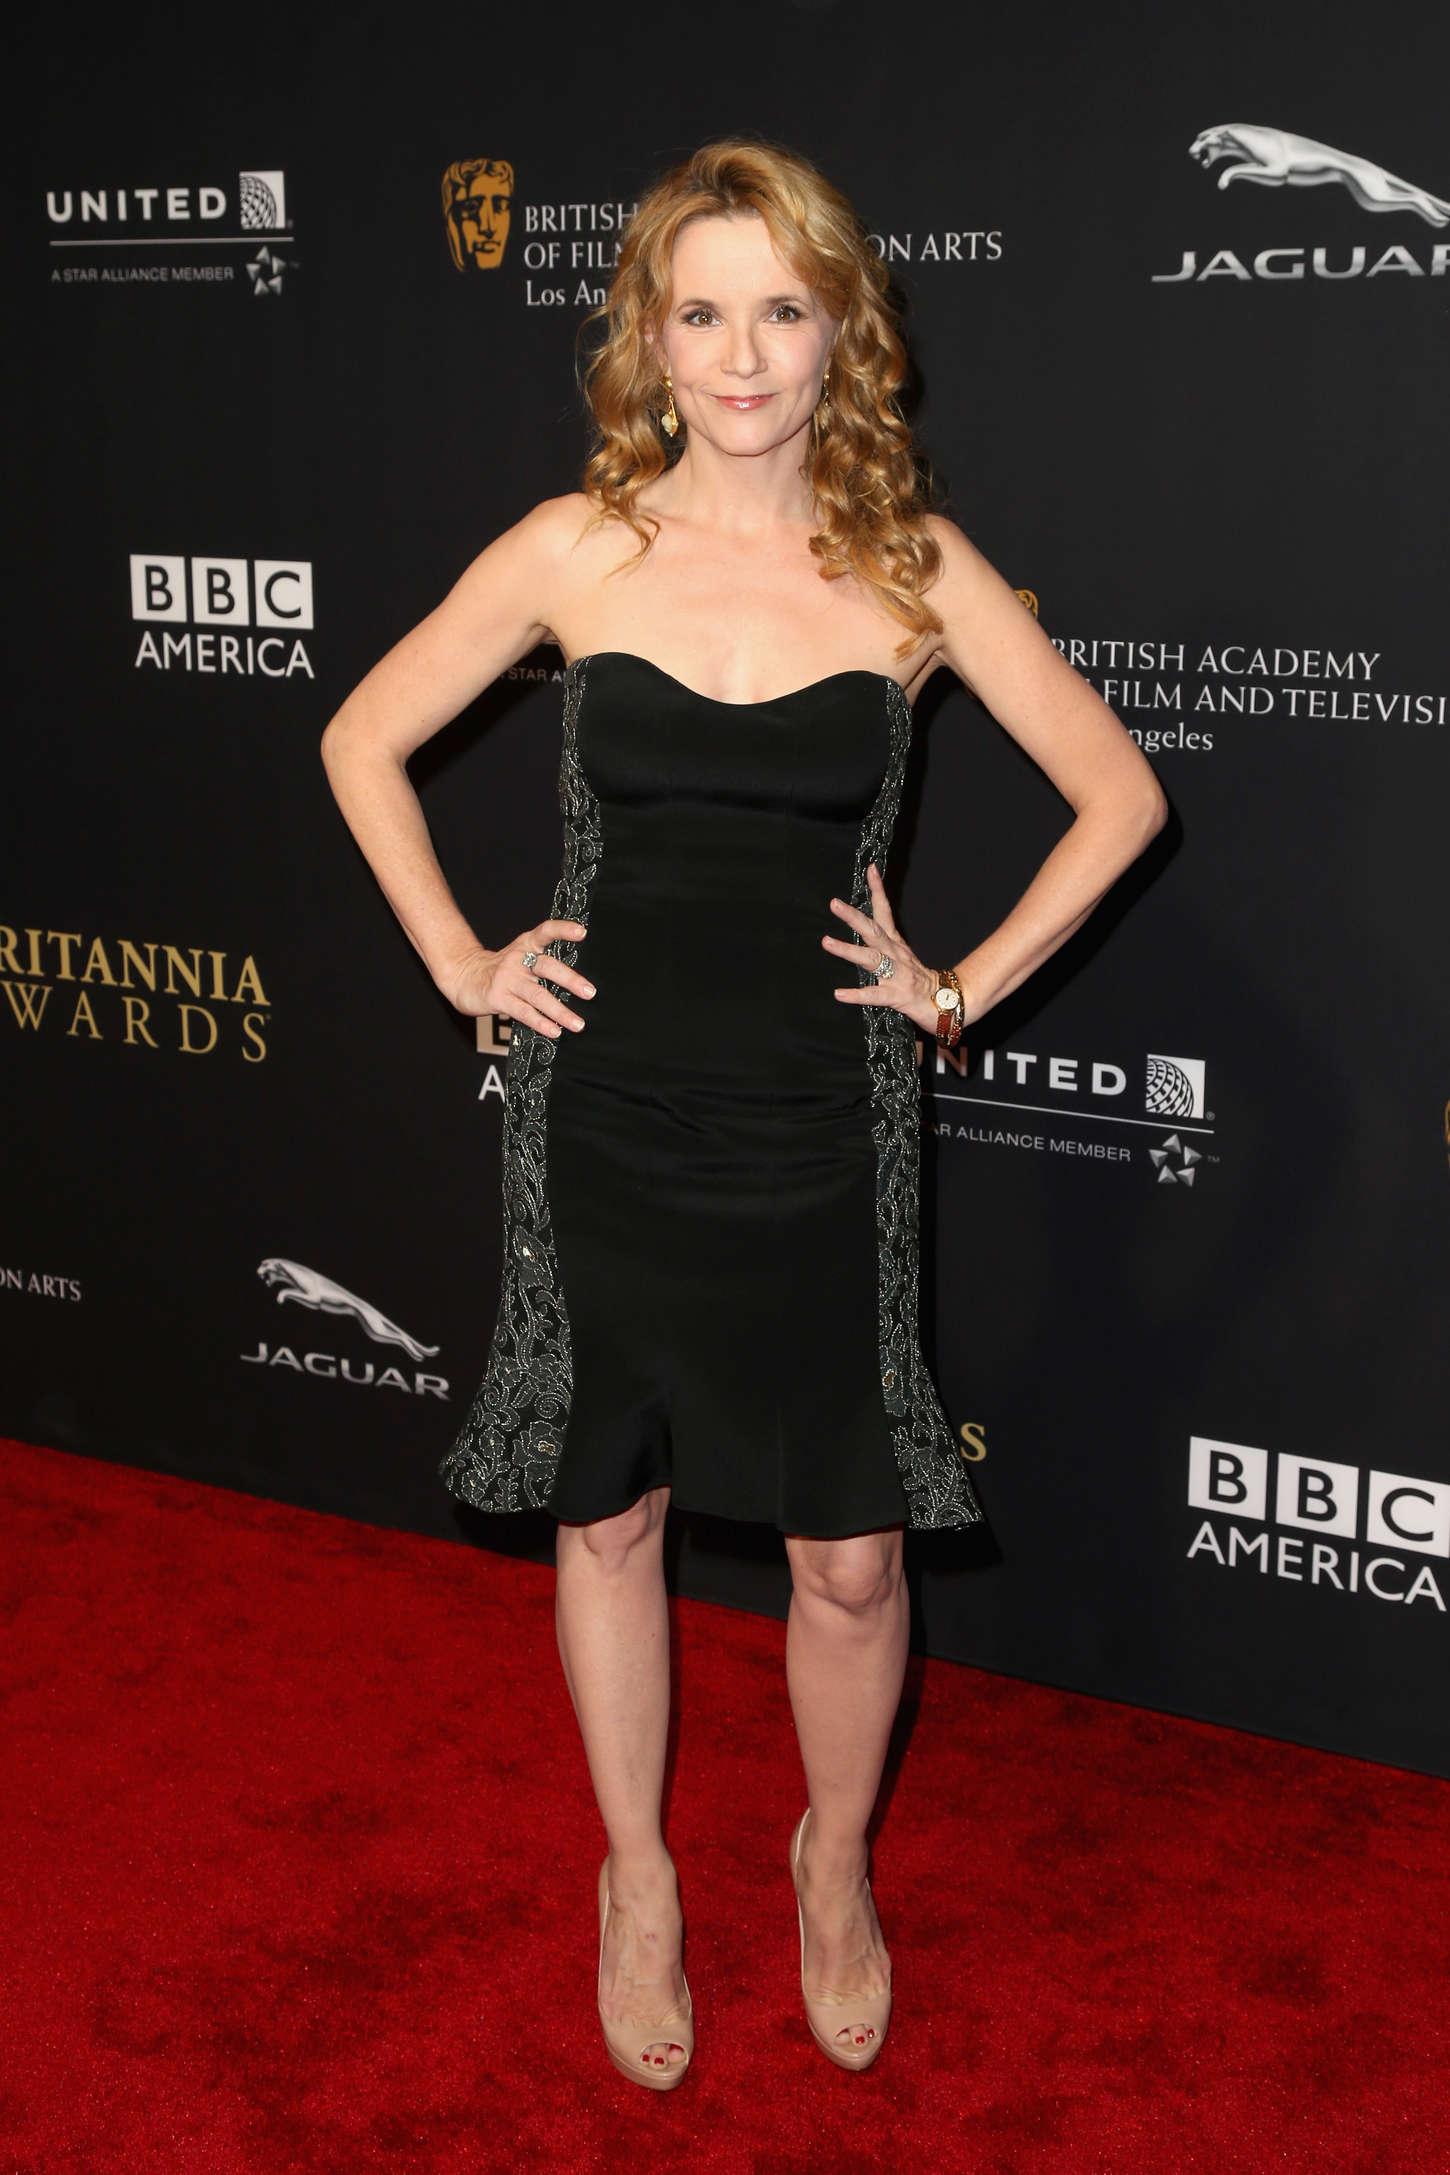 Lea Thompson BAFTA Los Angeles Jaguar Britannia Awards in Beverly Hills